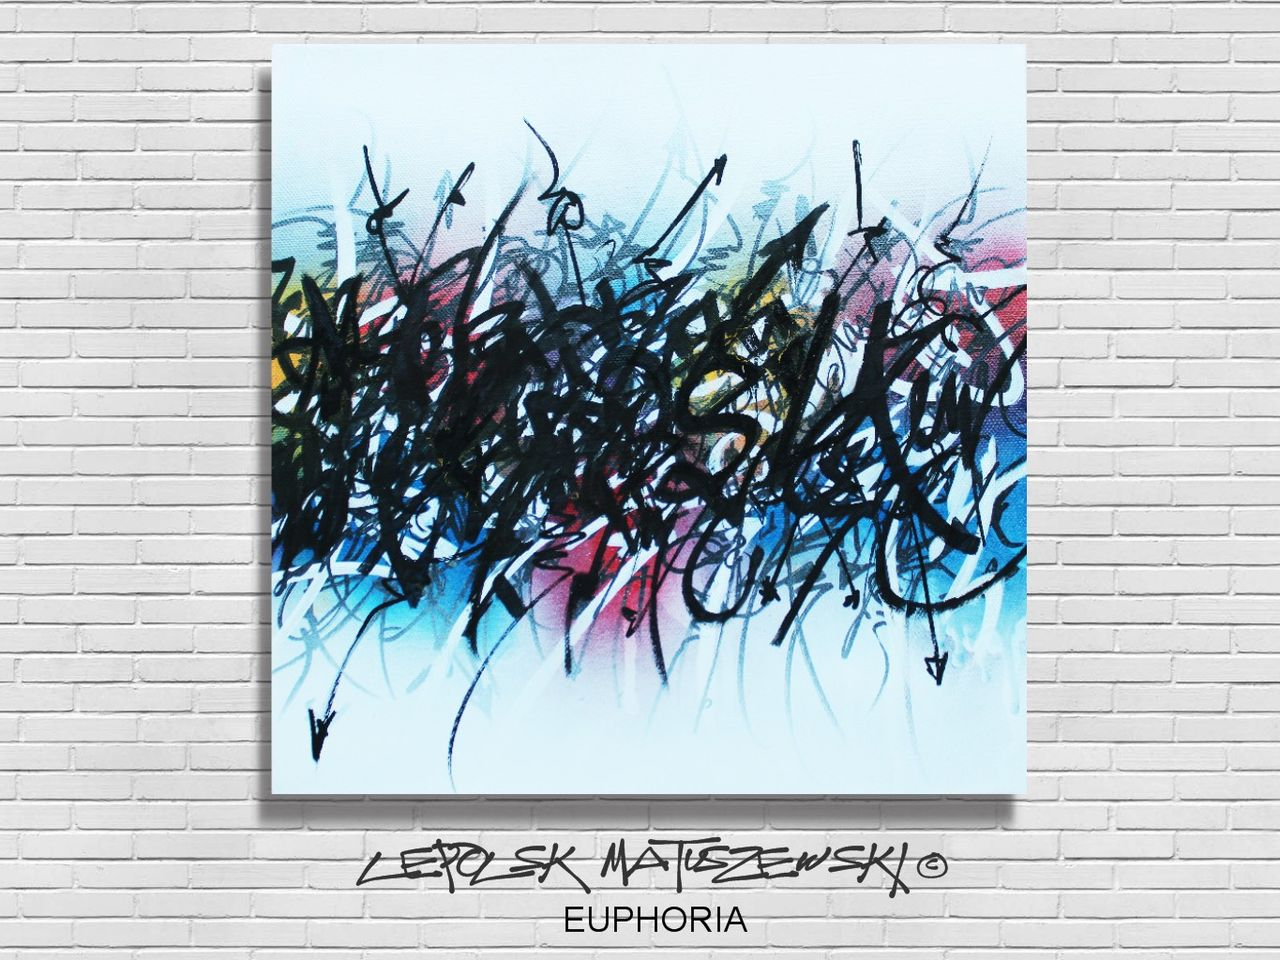 MISTER K  - Lepolsk Matuszewski EUPHORIA street art calligraffiti graffiti abstrait